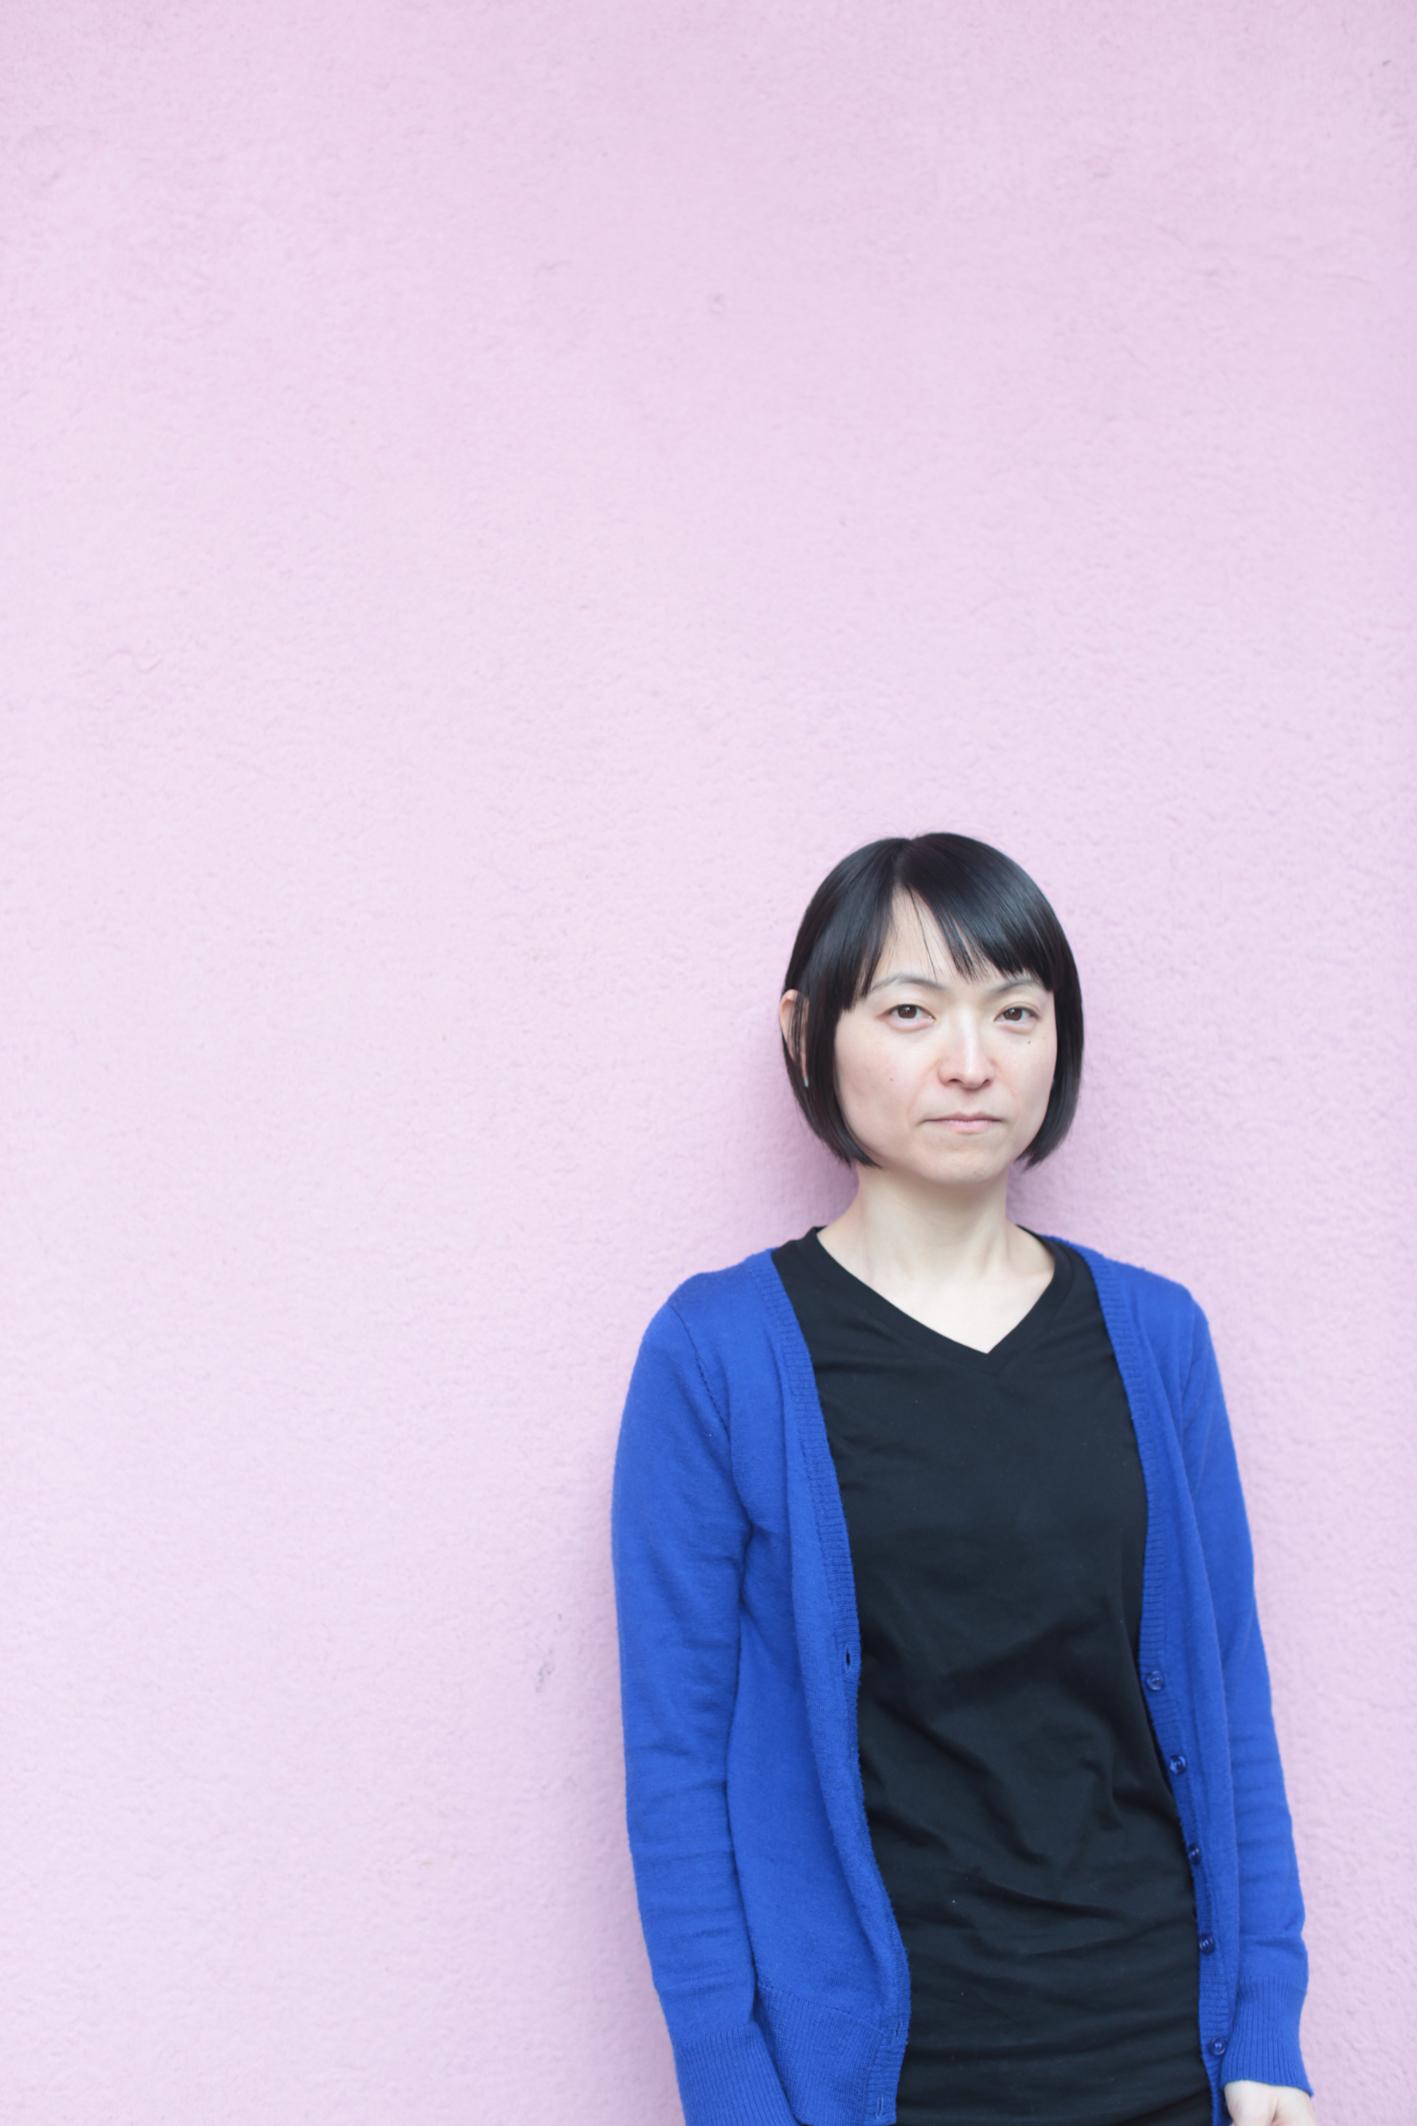 http://rooftop.cc/news/2015/06/22/hisako_tabuchi_M.jpg